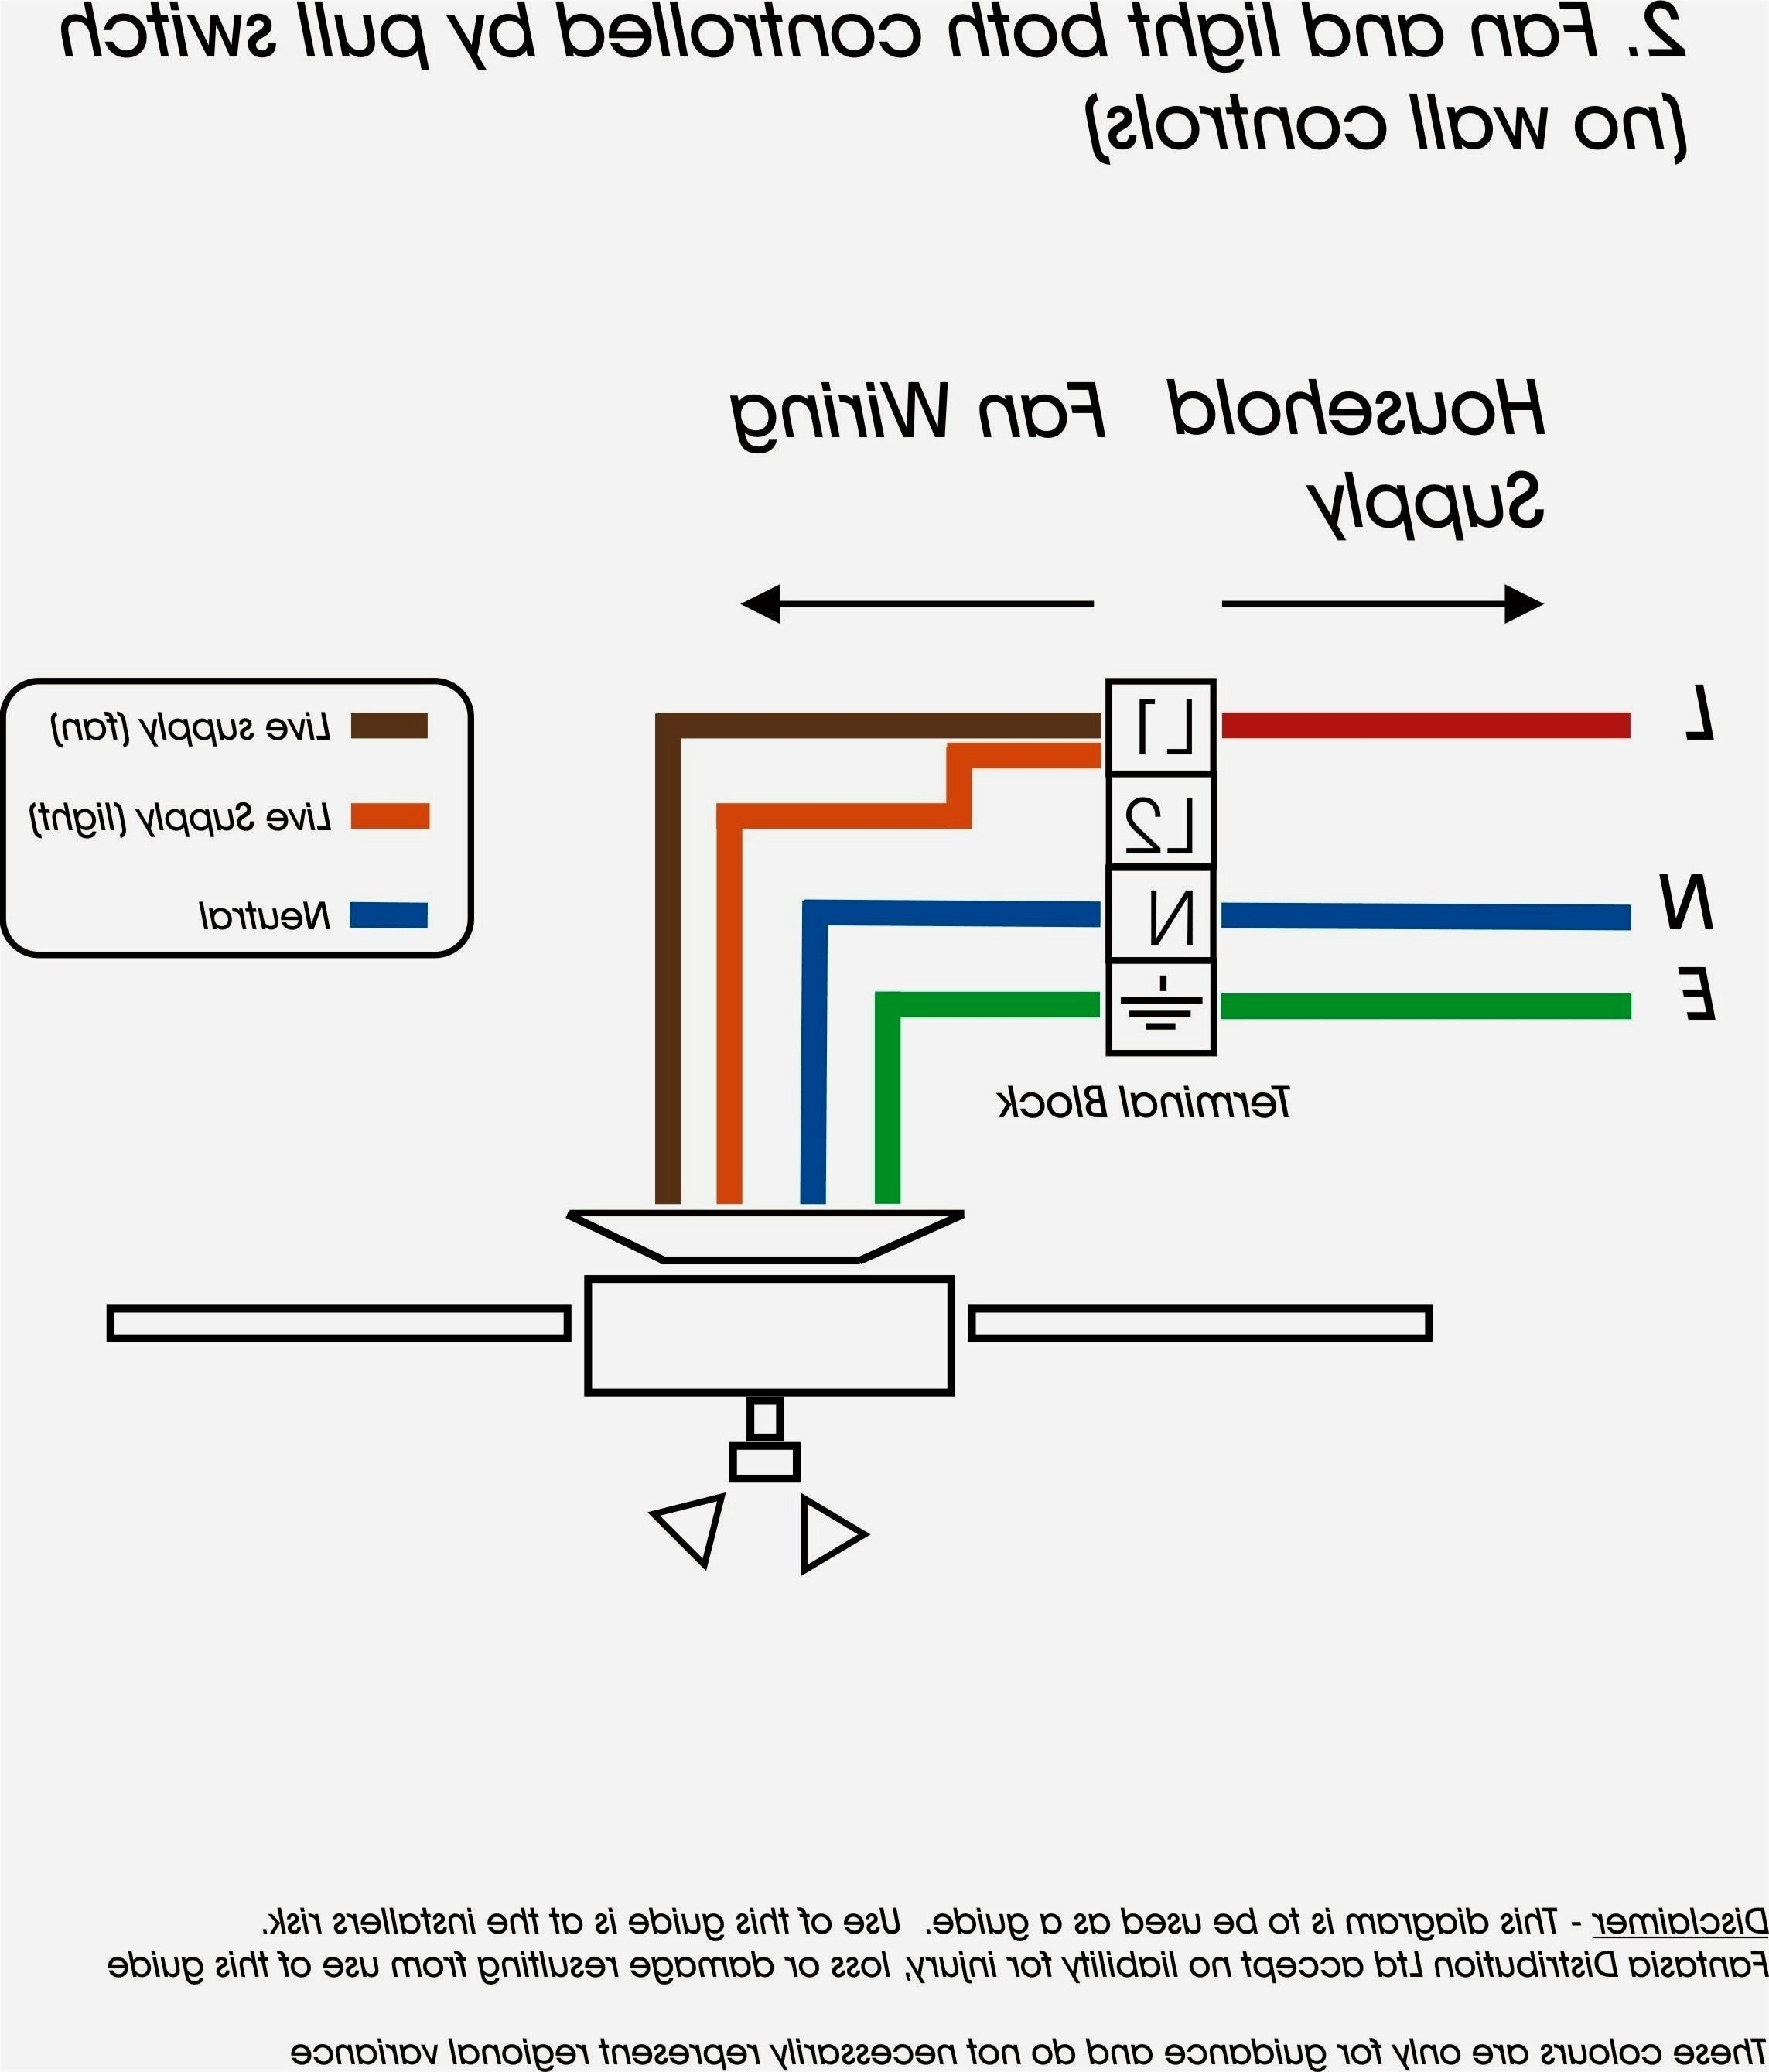 2 way switch wiring diagram Download-Wiring Diagram 2 Way Light Switch Australia Best Arlec Light Switch Wiring Diagram Australia Wire Center • 9-q